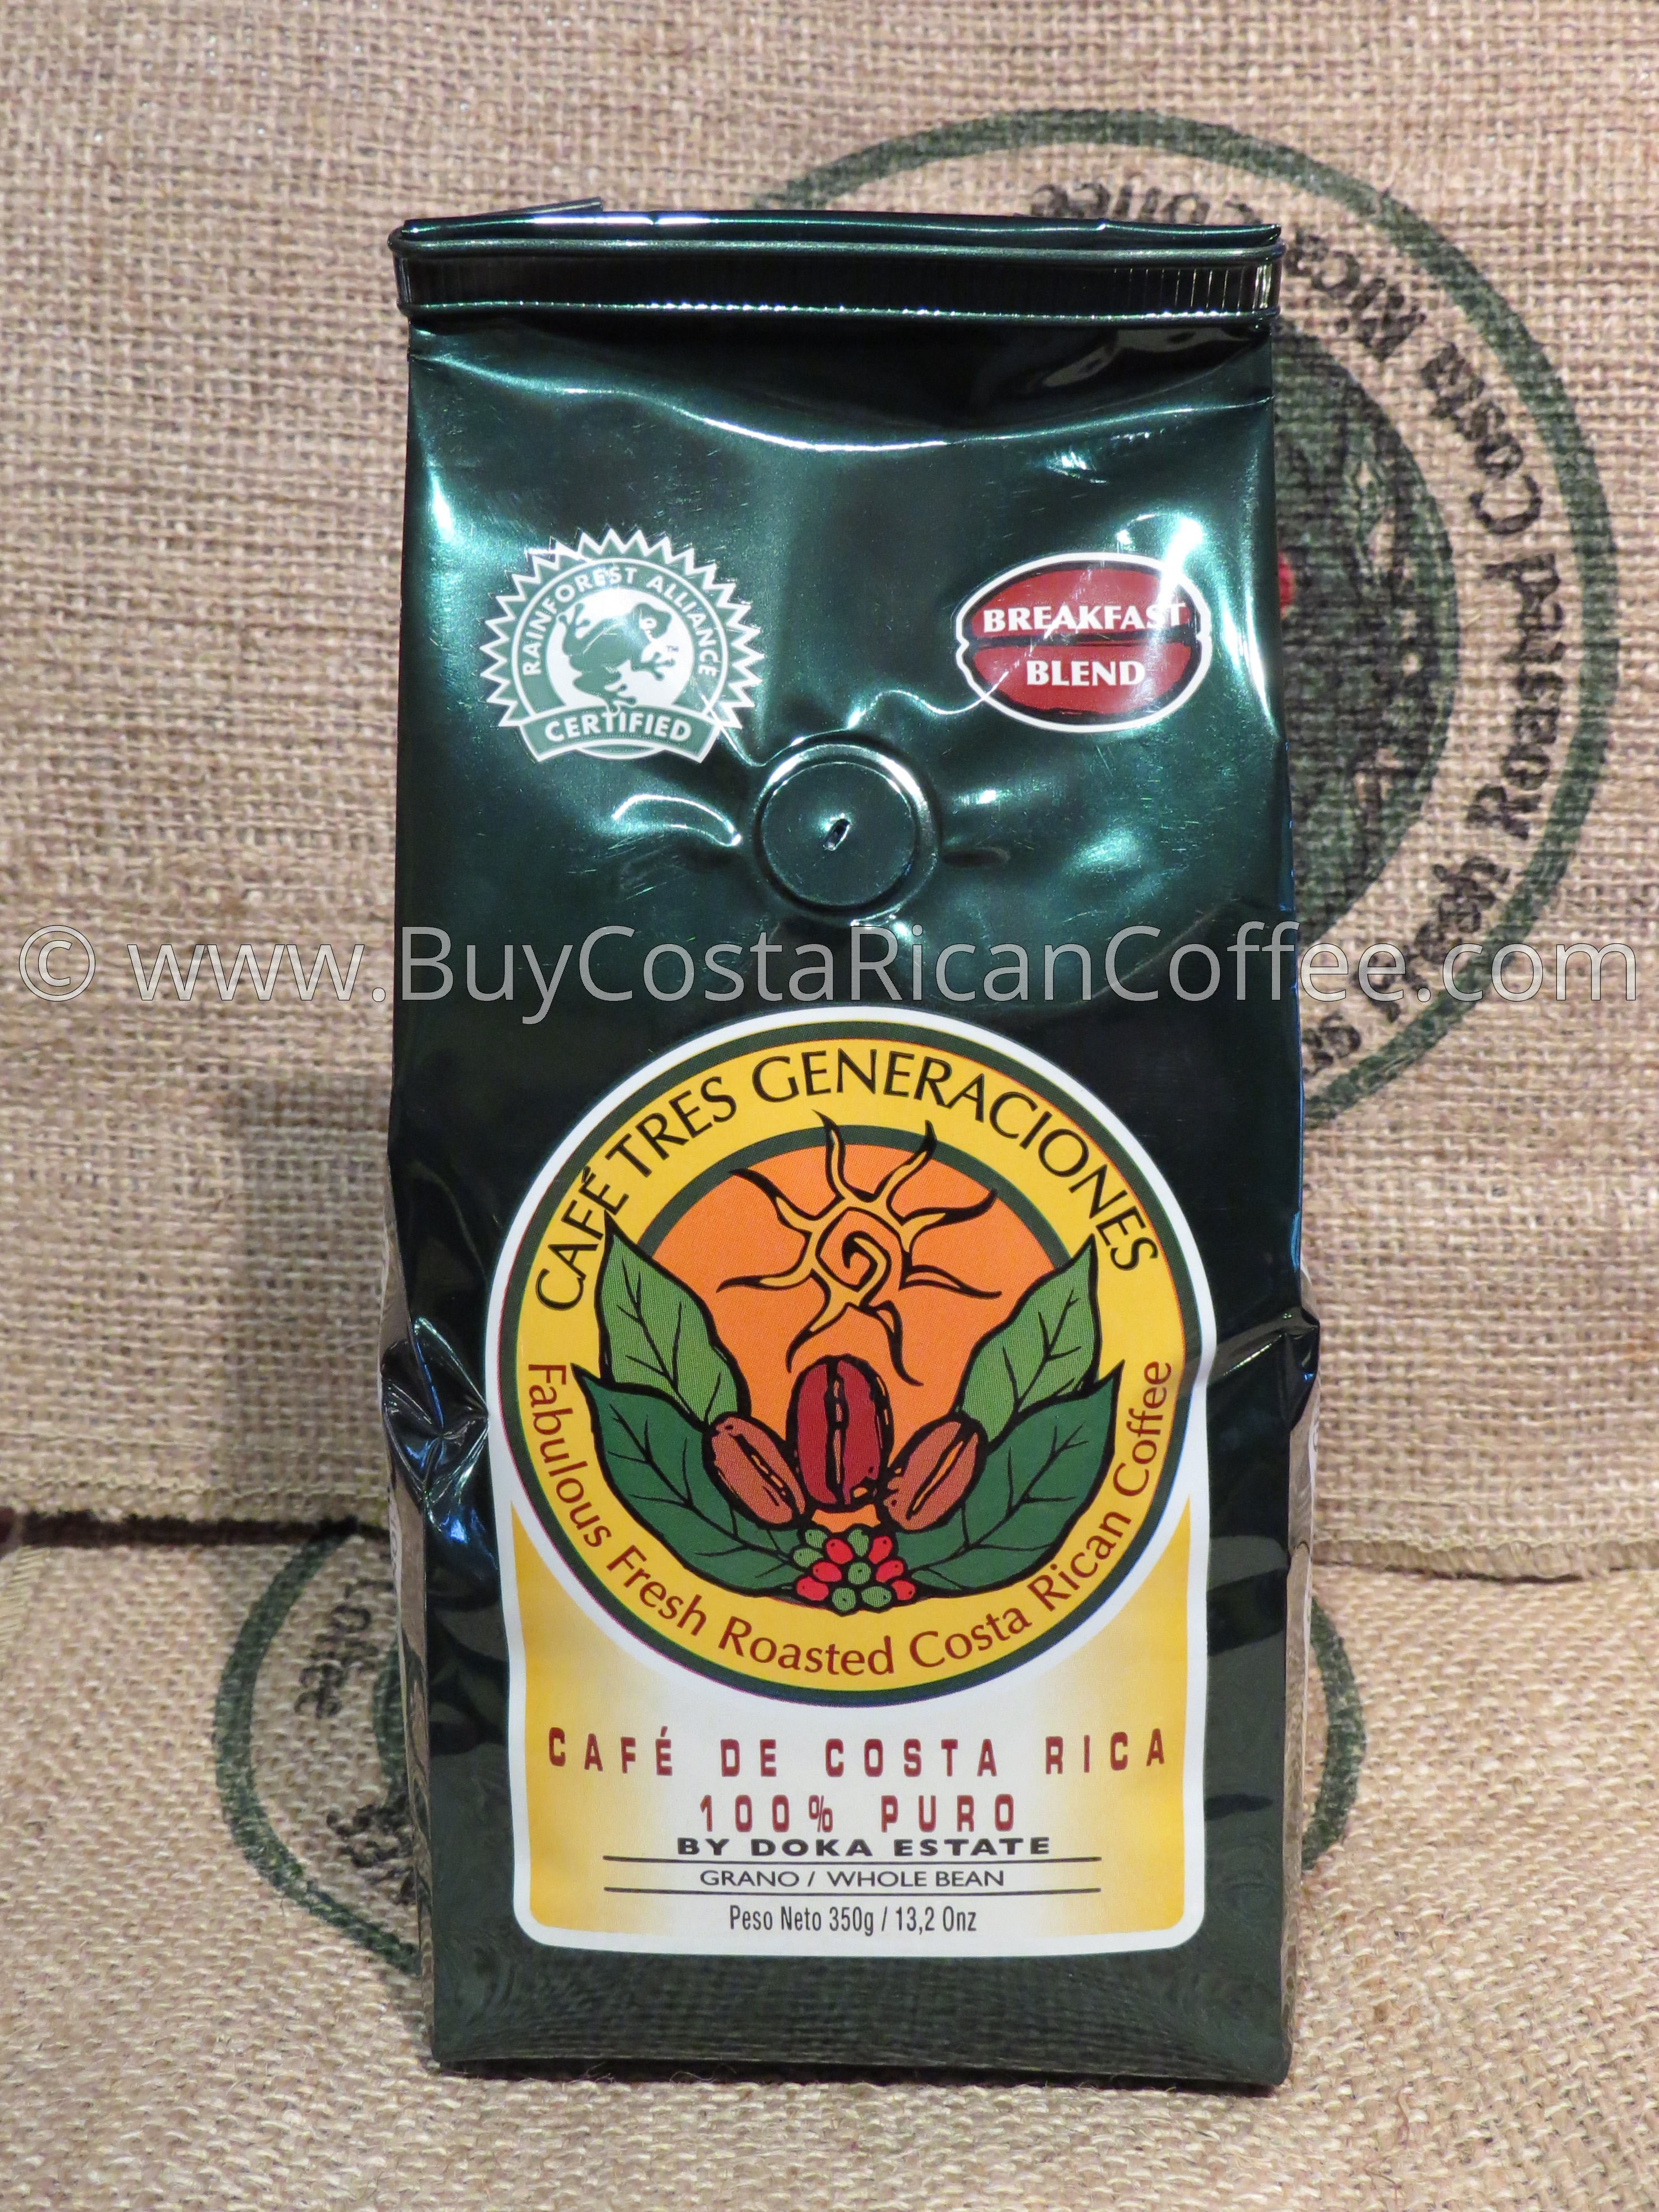 Whole Bean Breakfast Blend 350g - Buy Costa Rican Coffee